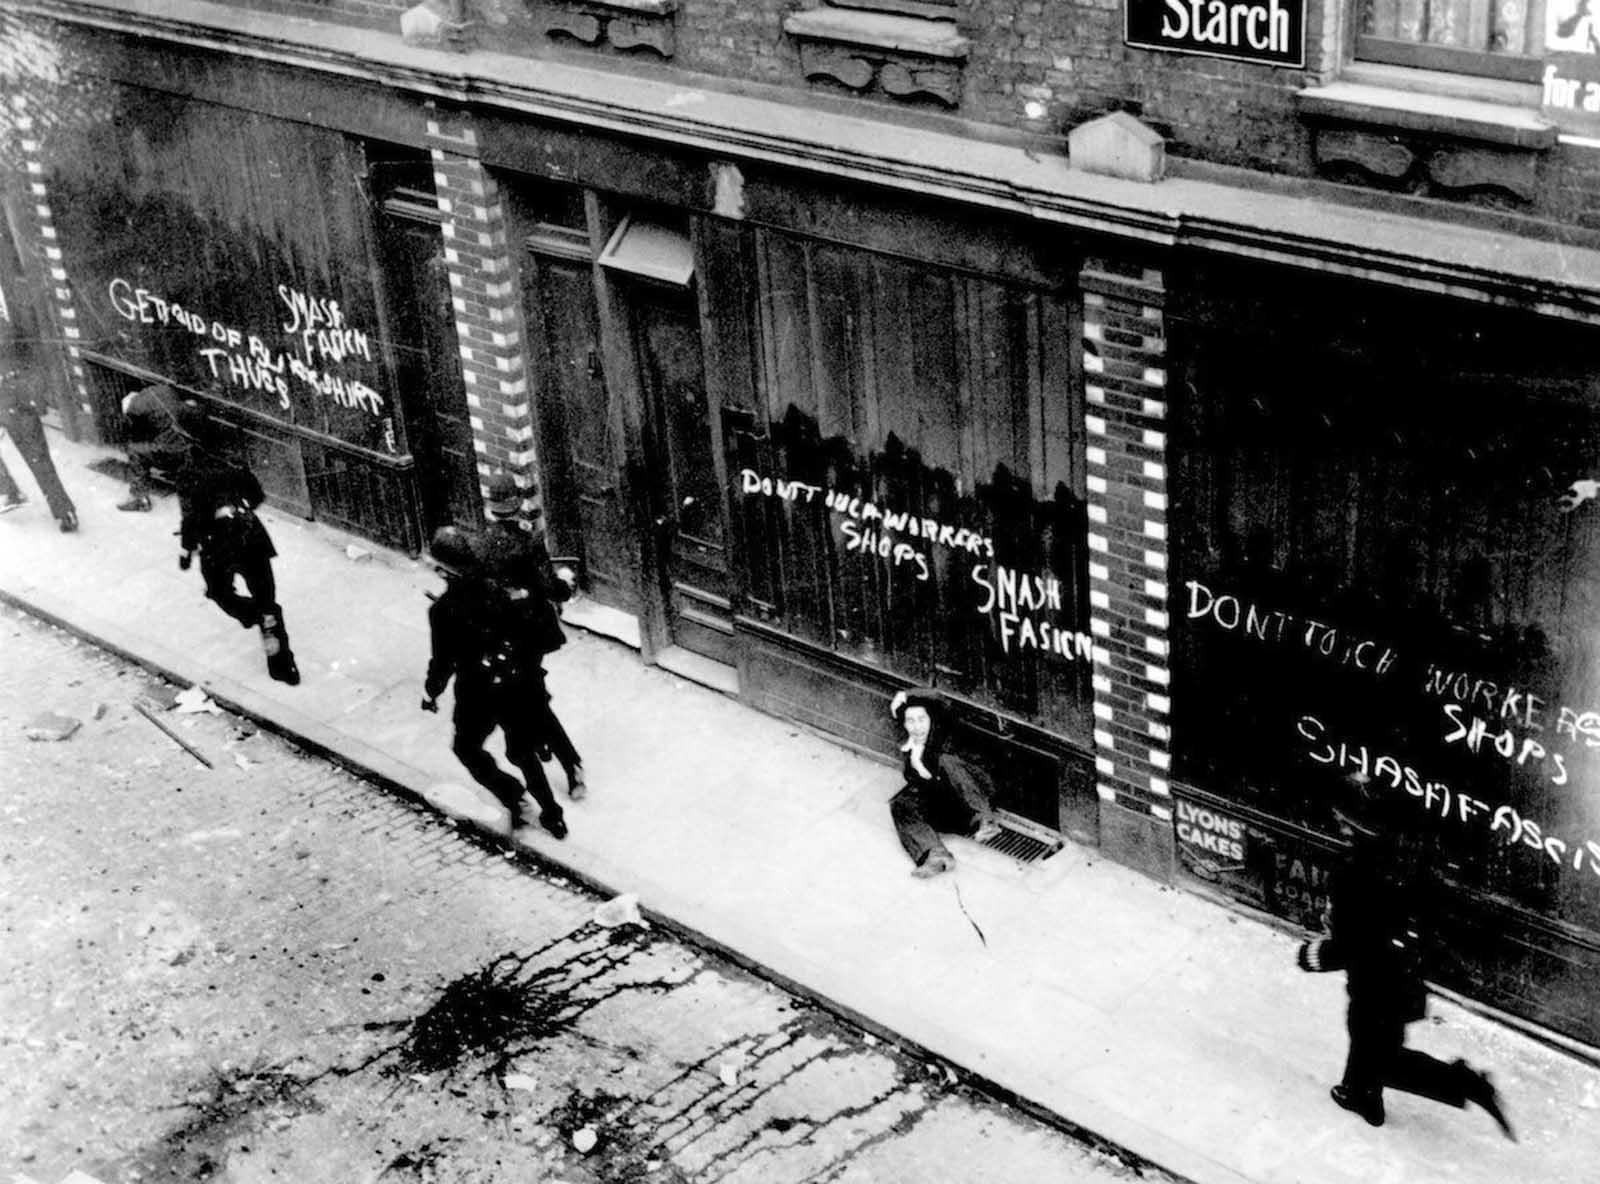 Policemen chasing Communist counter-demonstrators at a Fascist demonstration near Mark Lane, London. 1936.